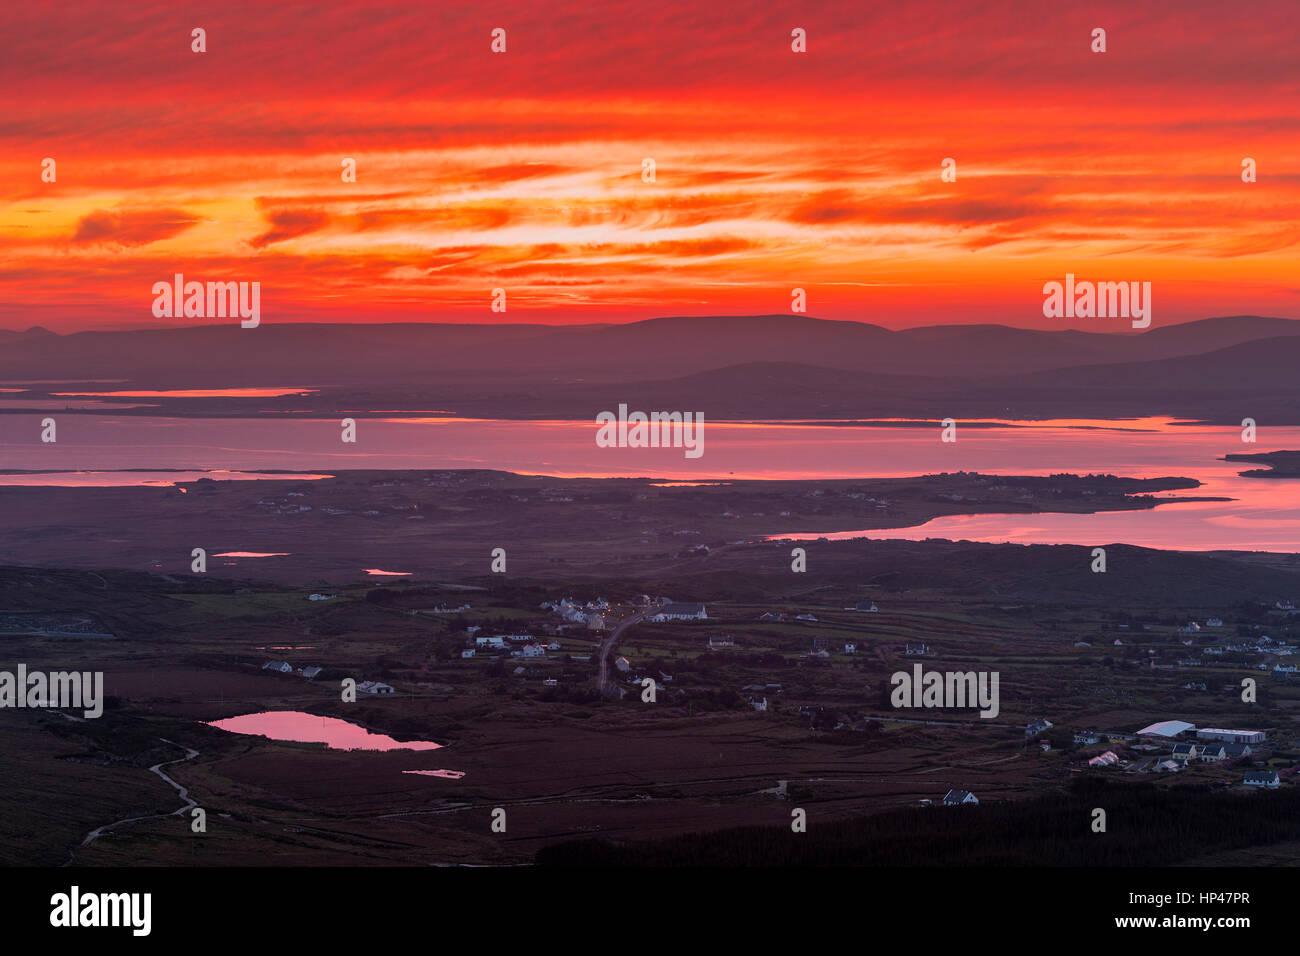 Achill Island seen from Minaun, County Mayo, Ireland, Europe. - Stock Image